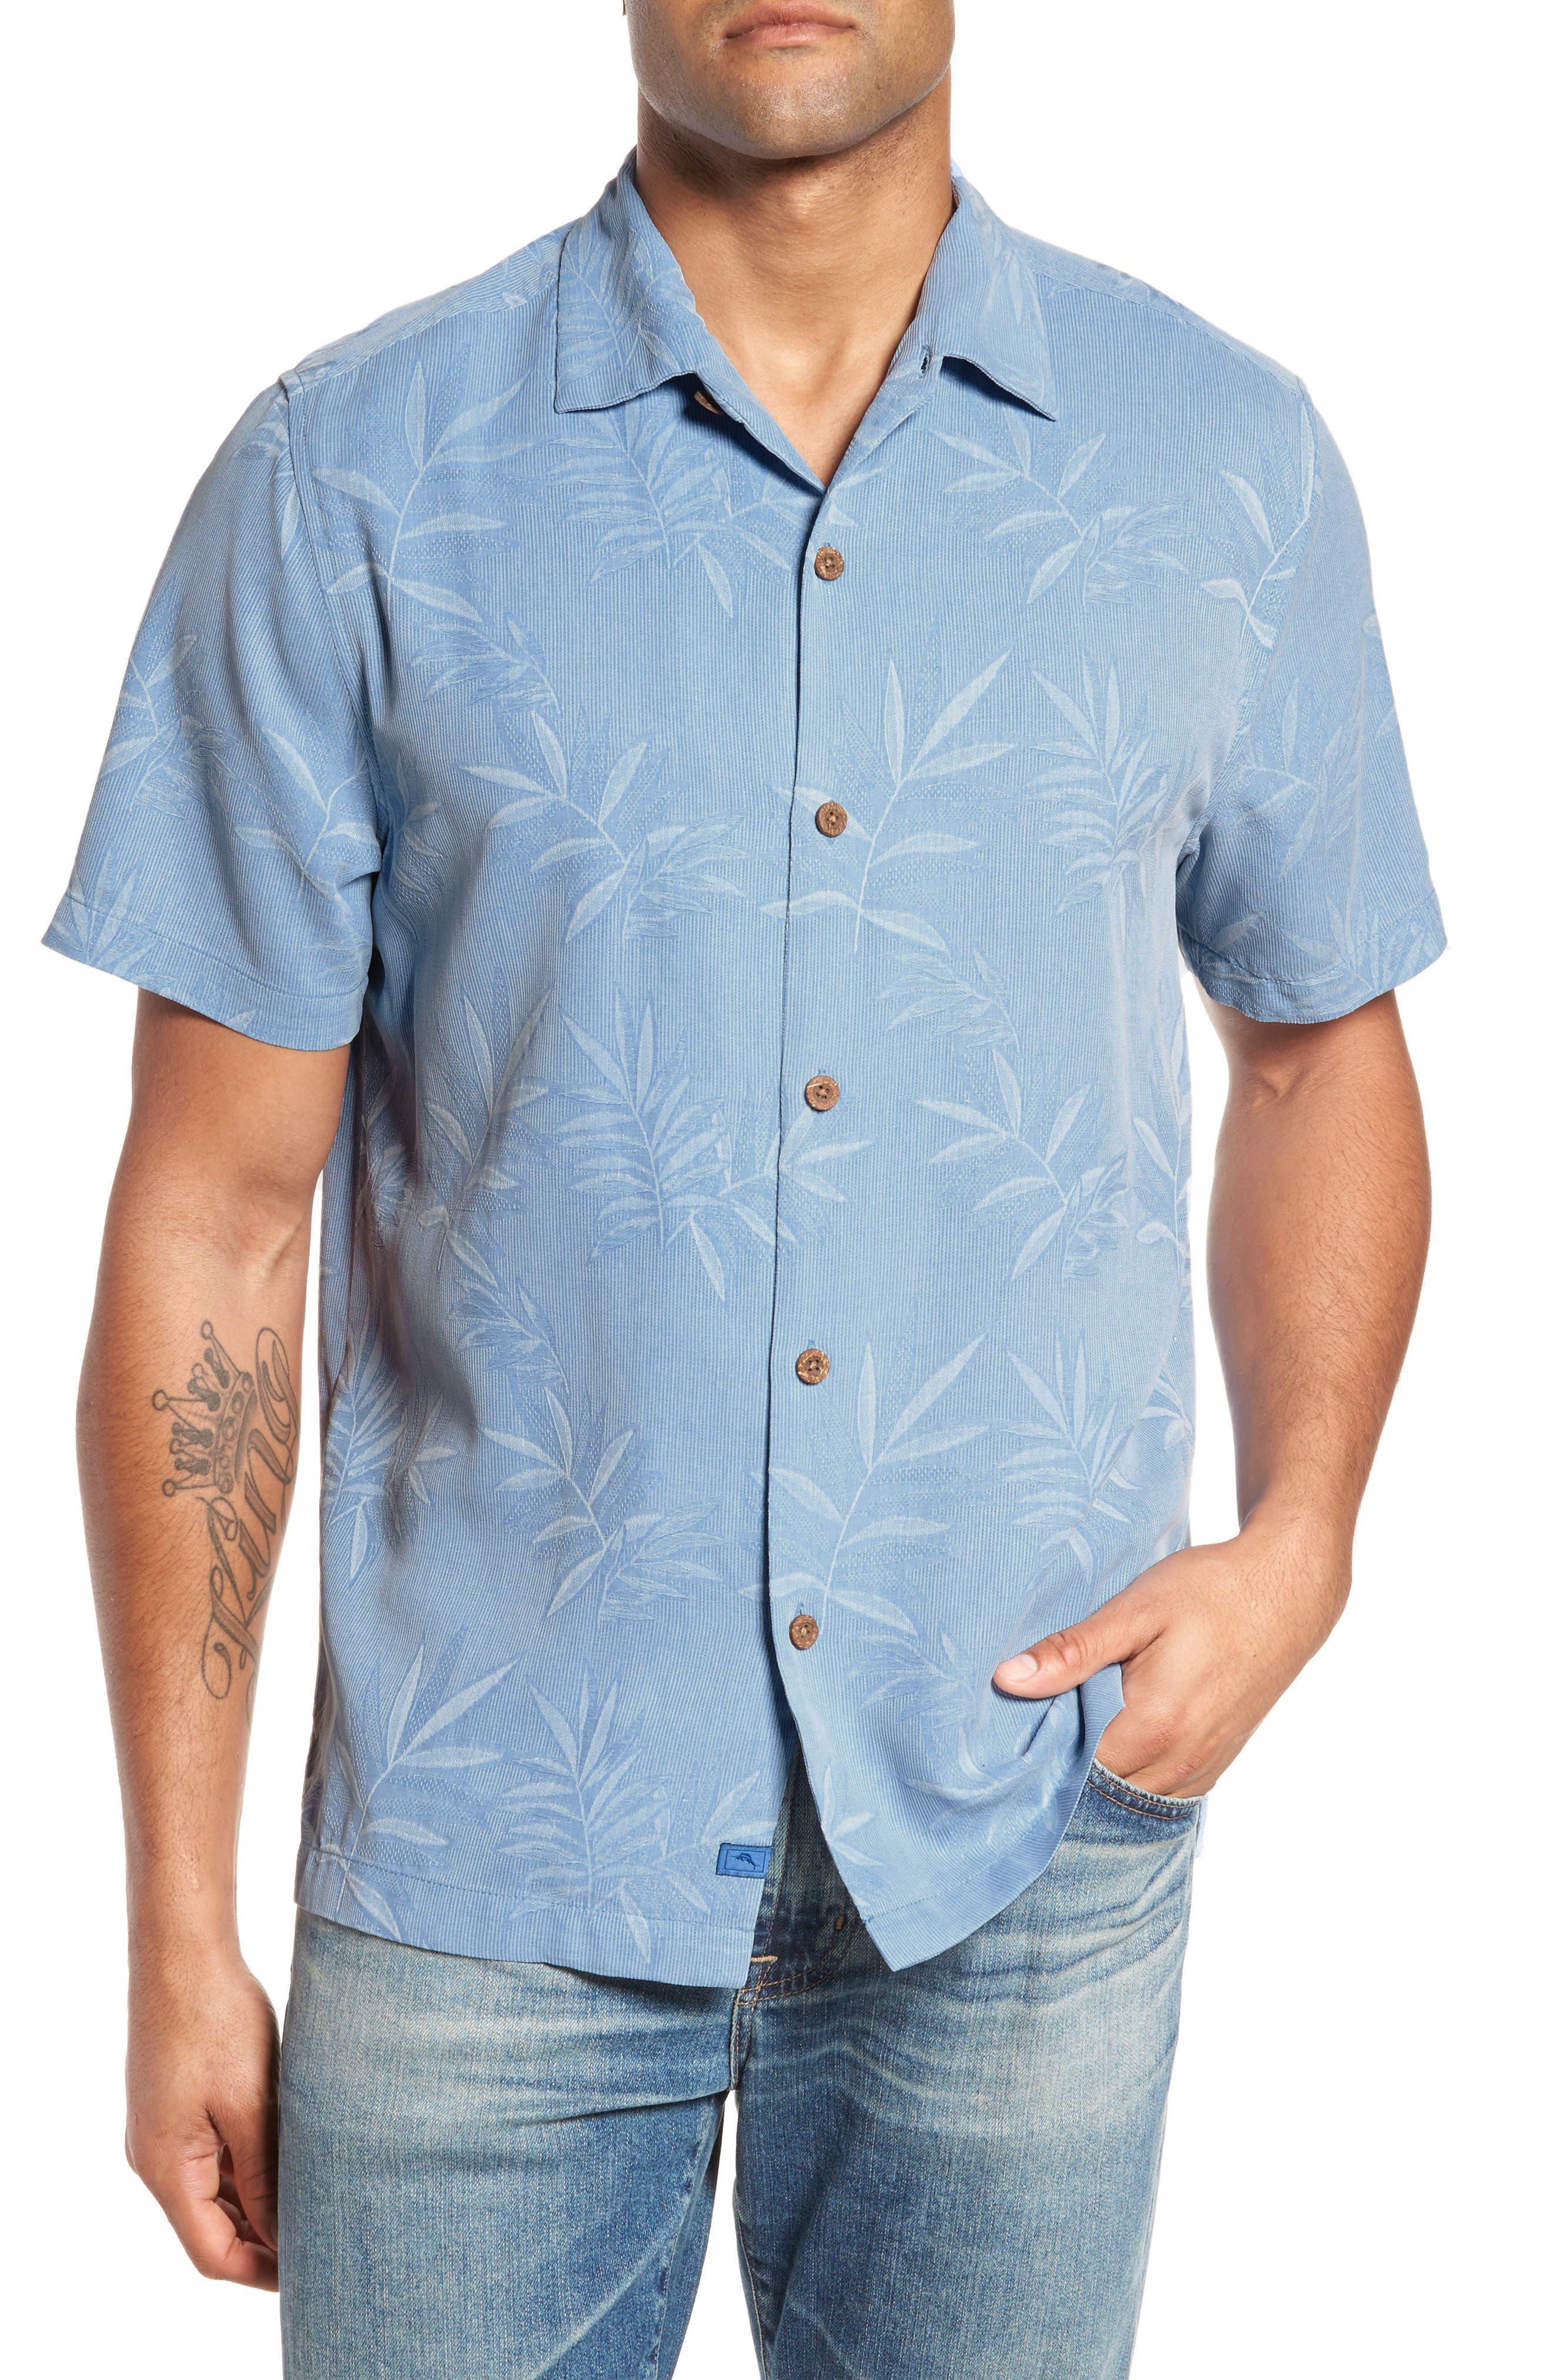 Luau Floral Silk Shirt,                             Main thumbnail 1, color,                             LIGHT SKY